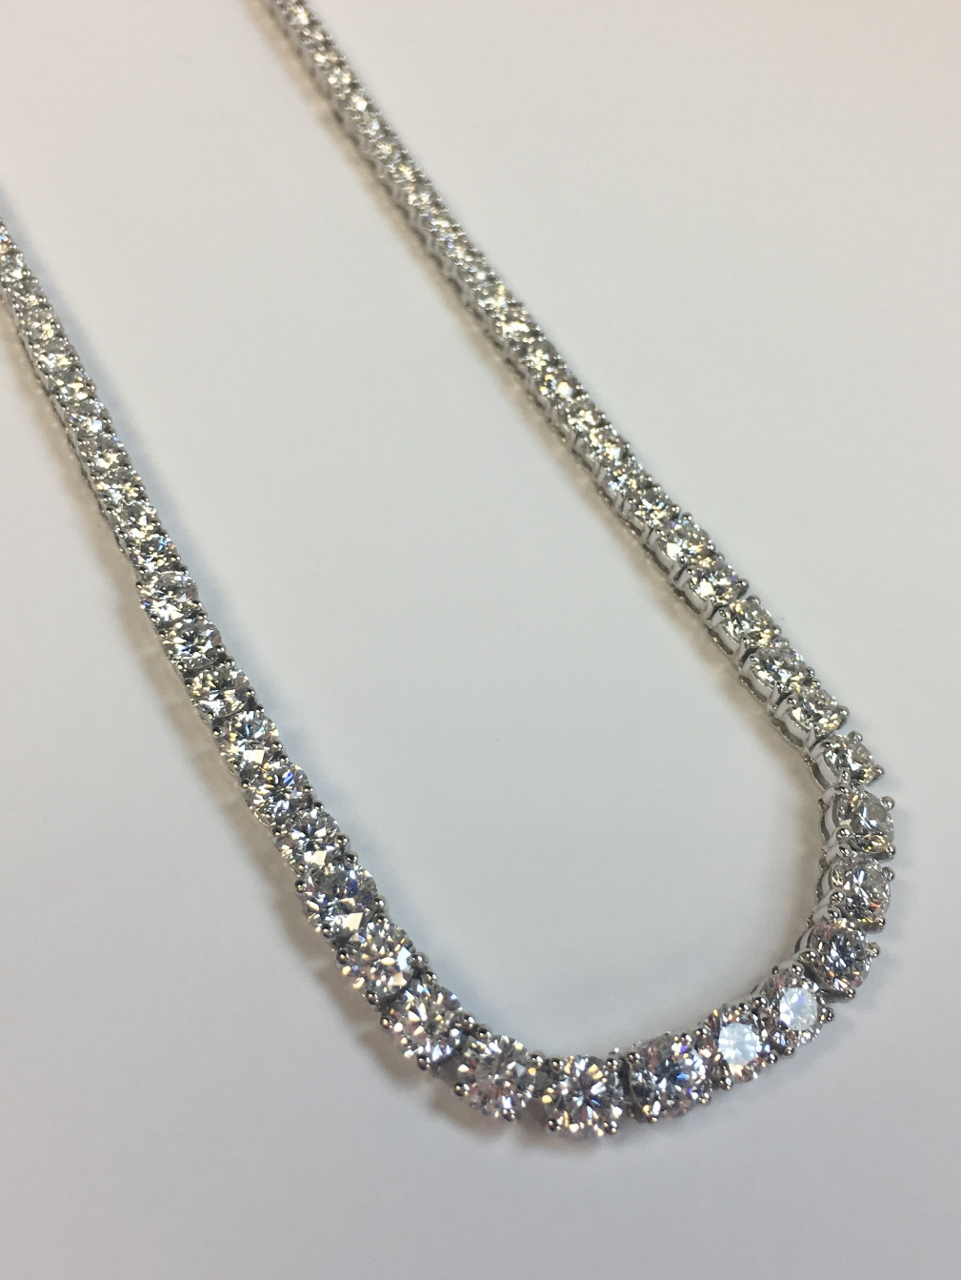 10 Carats Diamond Tennis Necklace